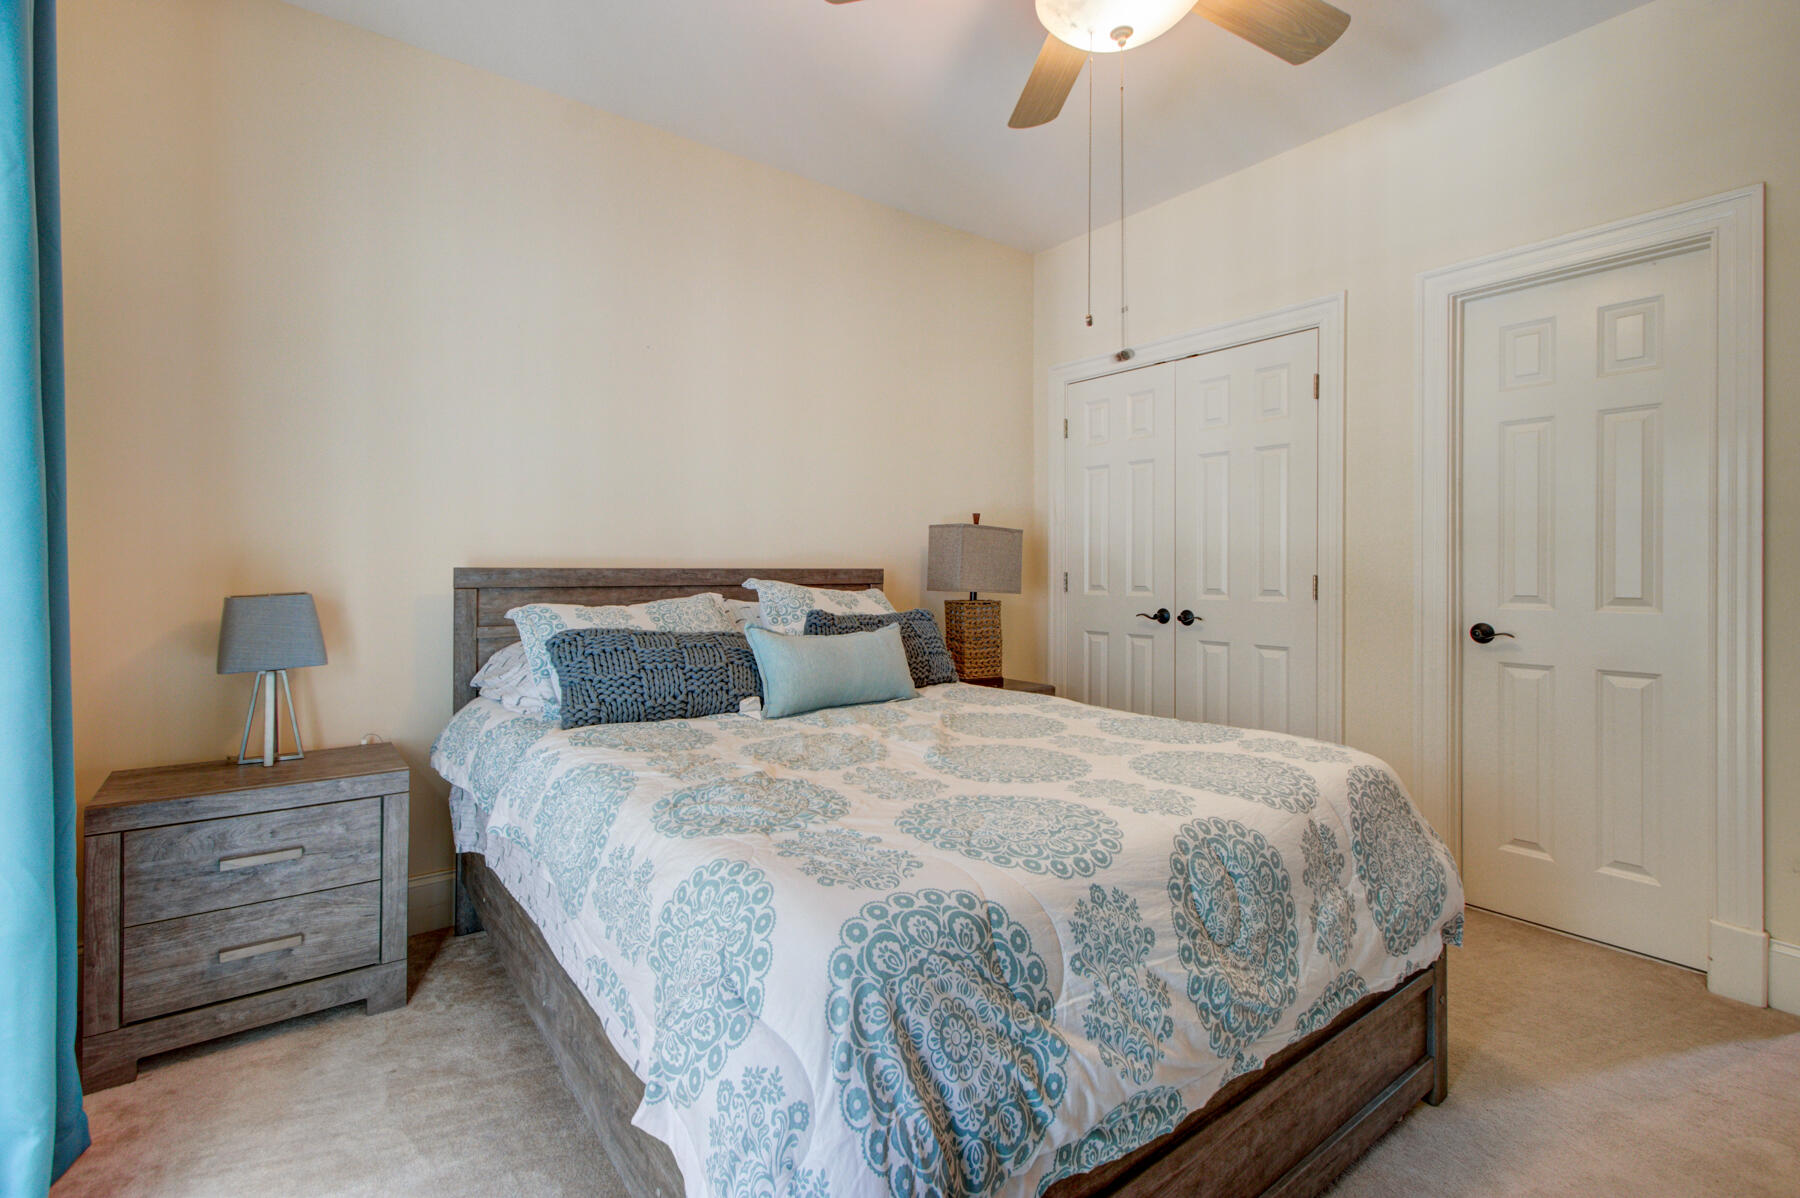 Dunes West Homes For Sale - 3095 Pignatelli, Mount Pleasant, SC - 5